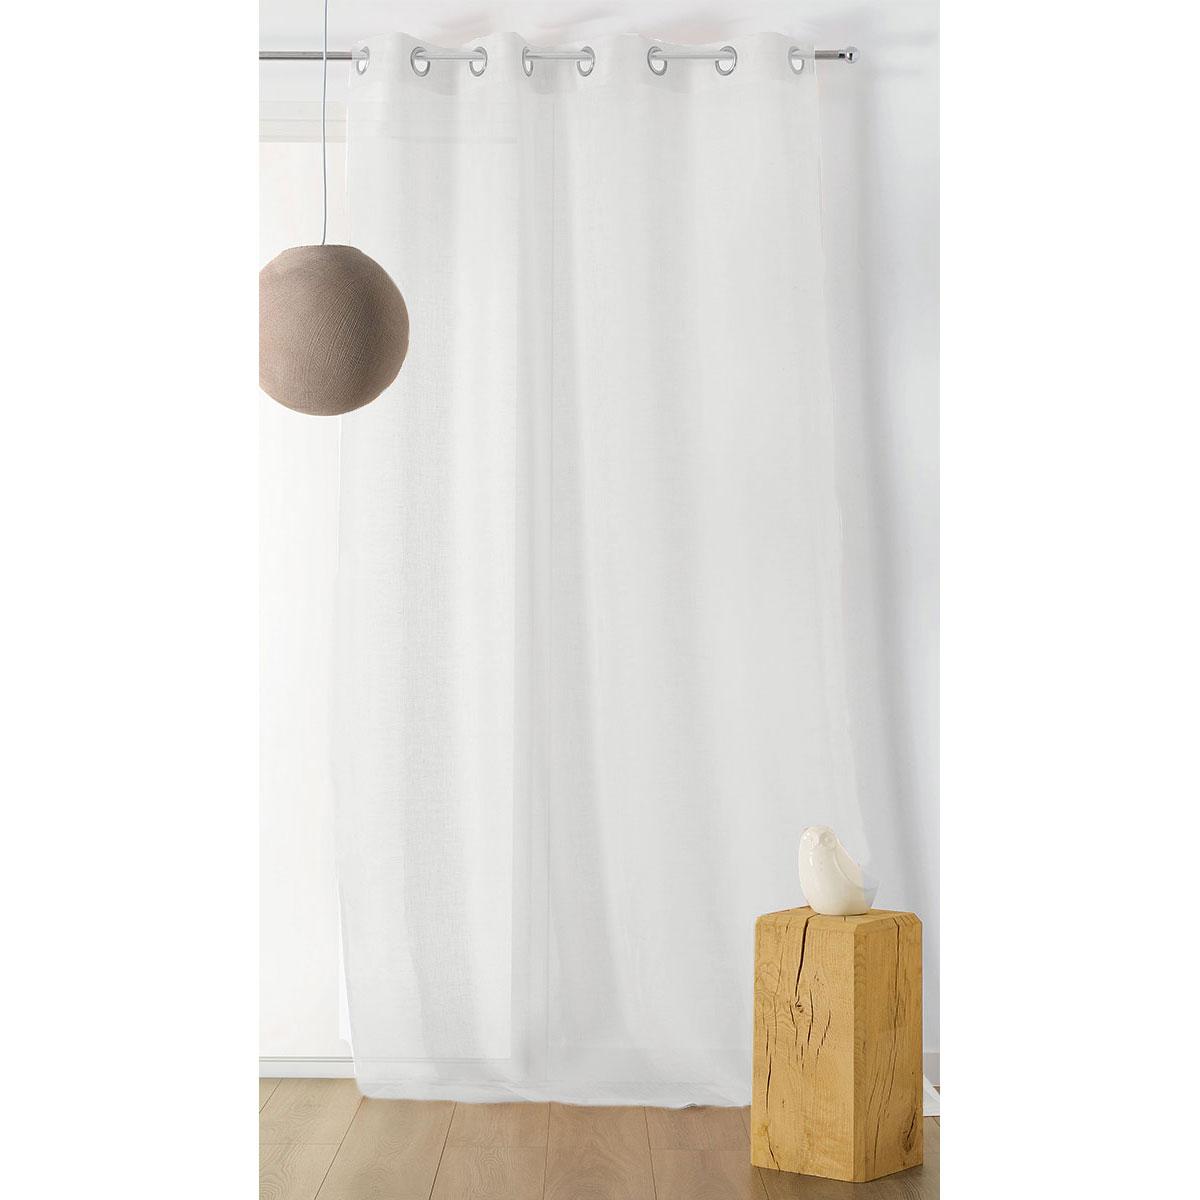 Voilage Ignifugé M1 Non Feu Aspect Polyester/Lin (Blanc)